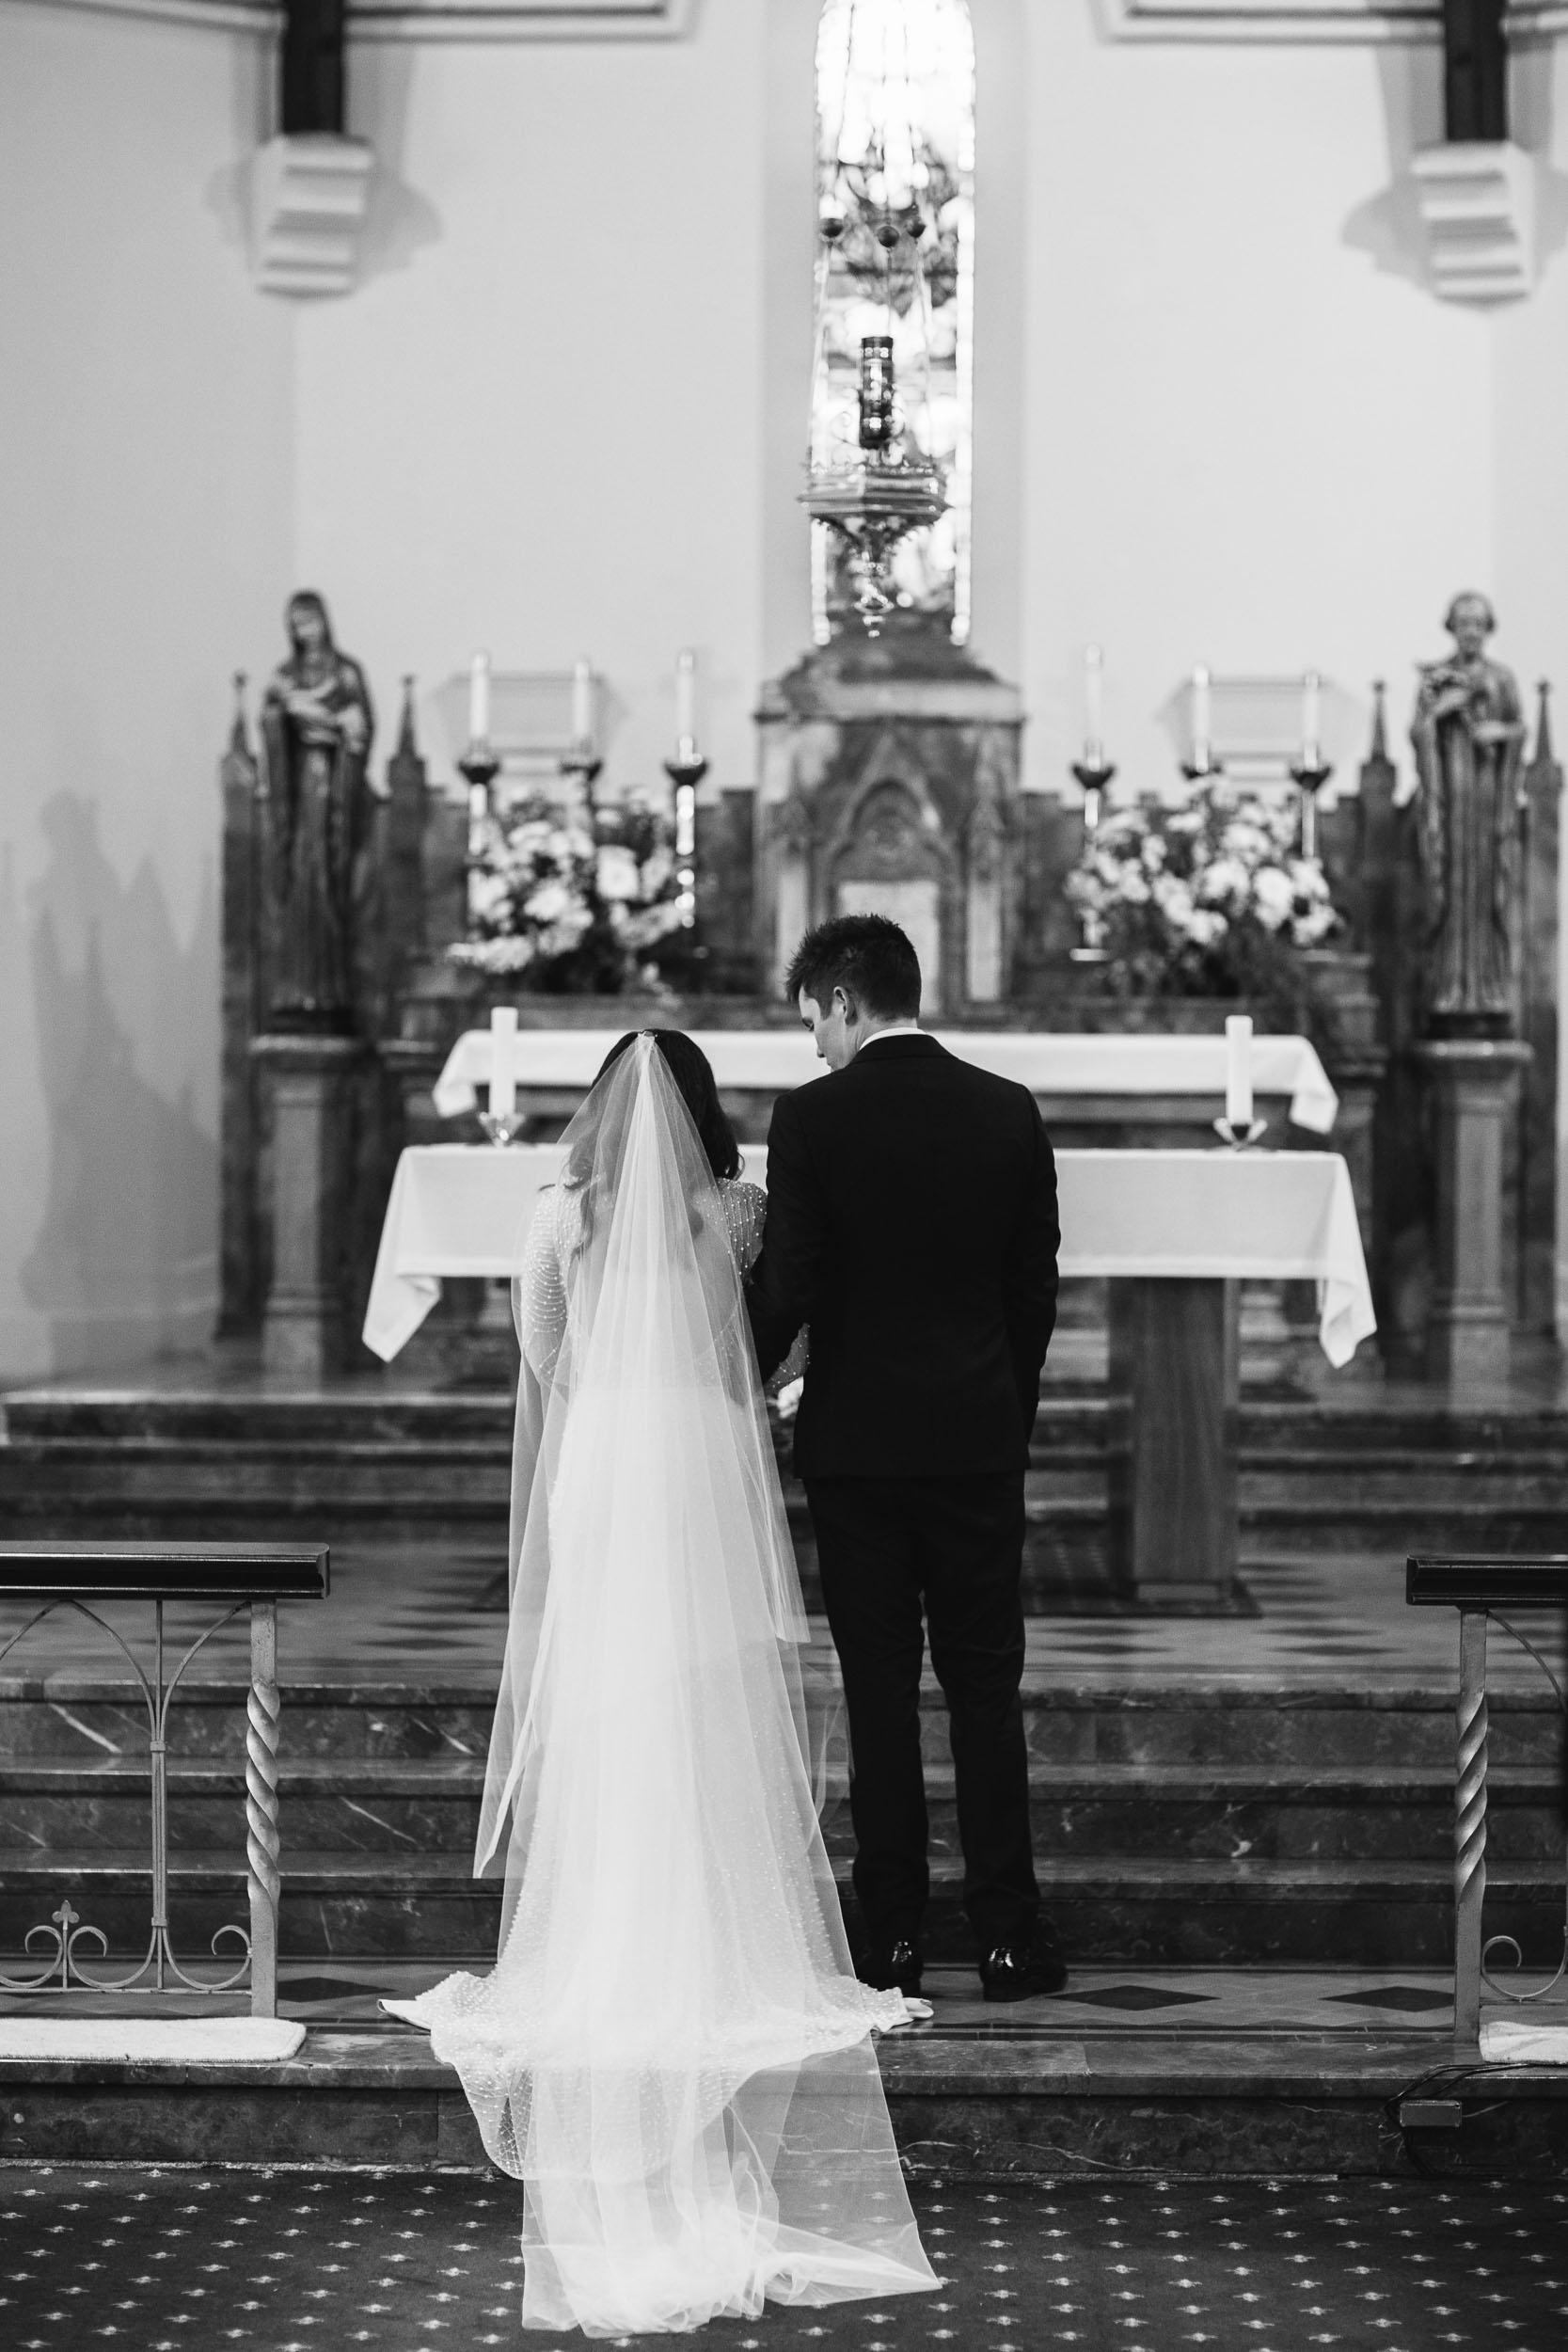 Kas-Richards-Wedding-Photographer-Melbourne-City-Wedding-Alto-Event-Space-Jane-Hill-Bridal-Gown-29.jpg